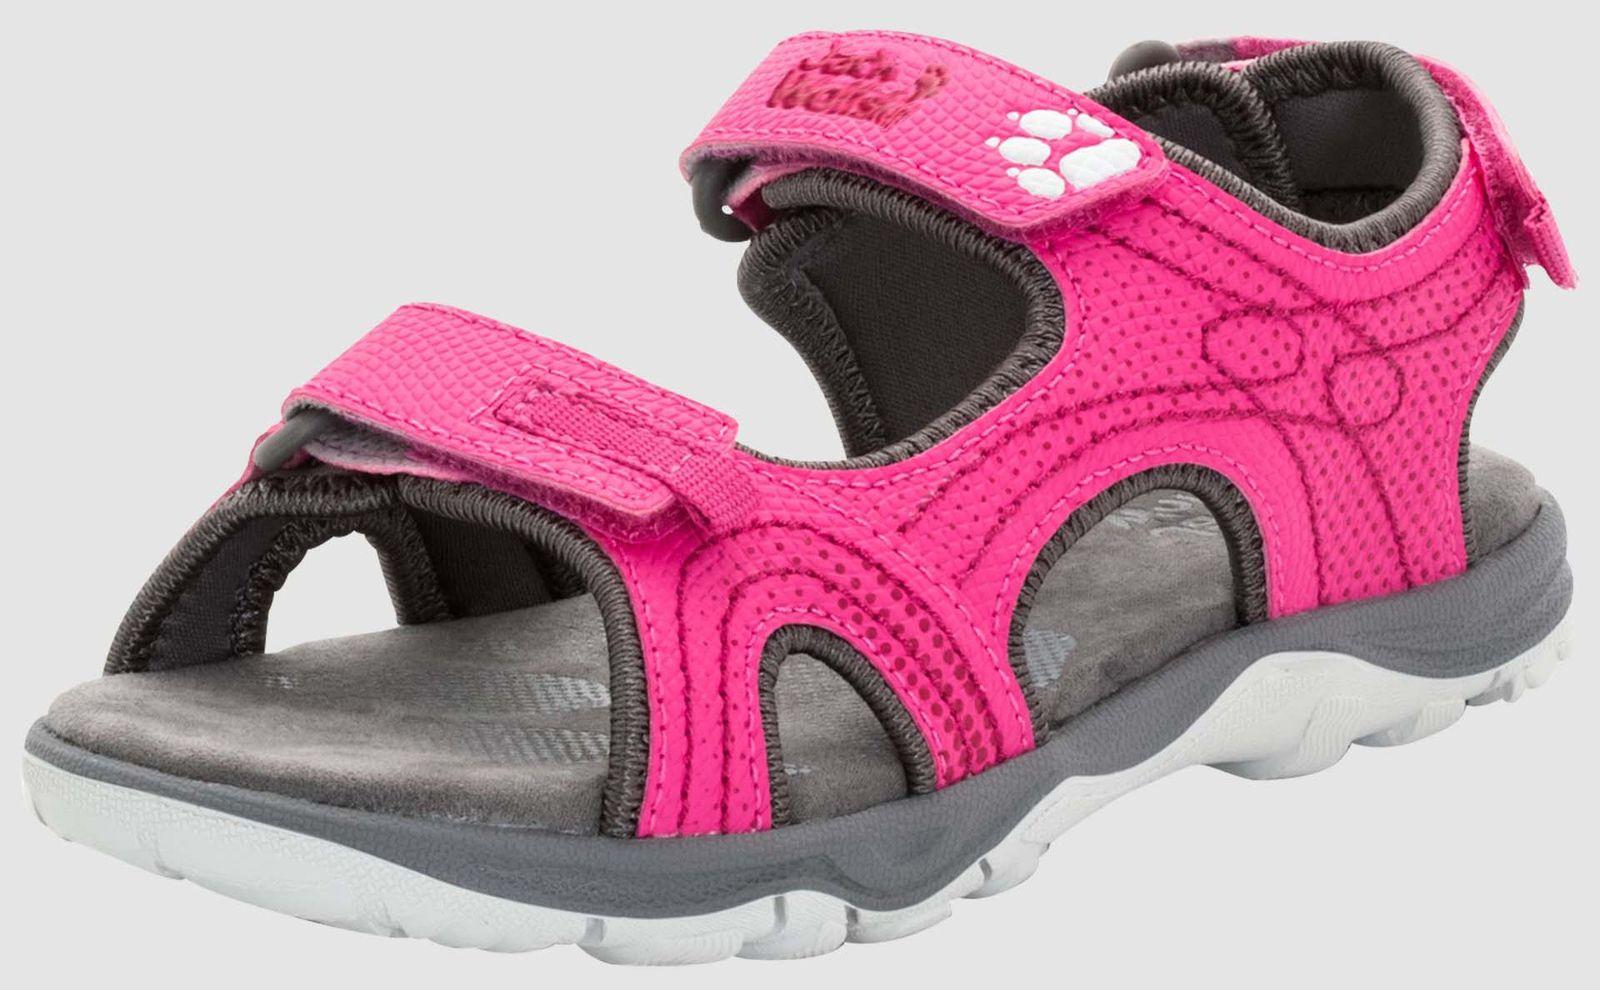 Сандалии Jack Wolfskin сандалии для девочки jack wolfskin acora цвет розовый 4022511 2081 размер 30